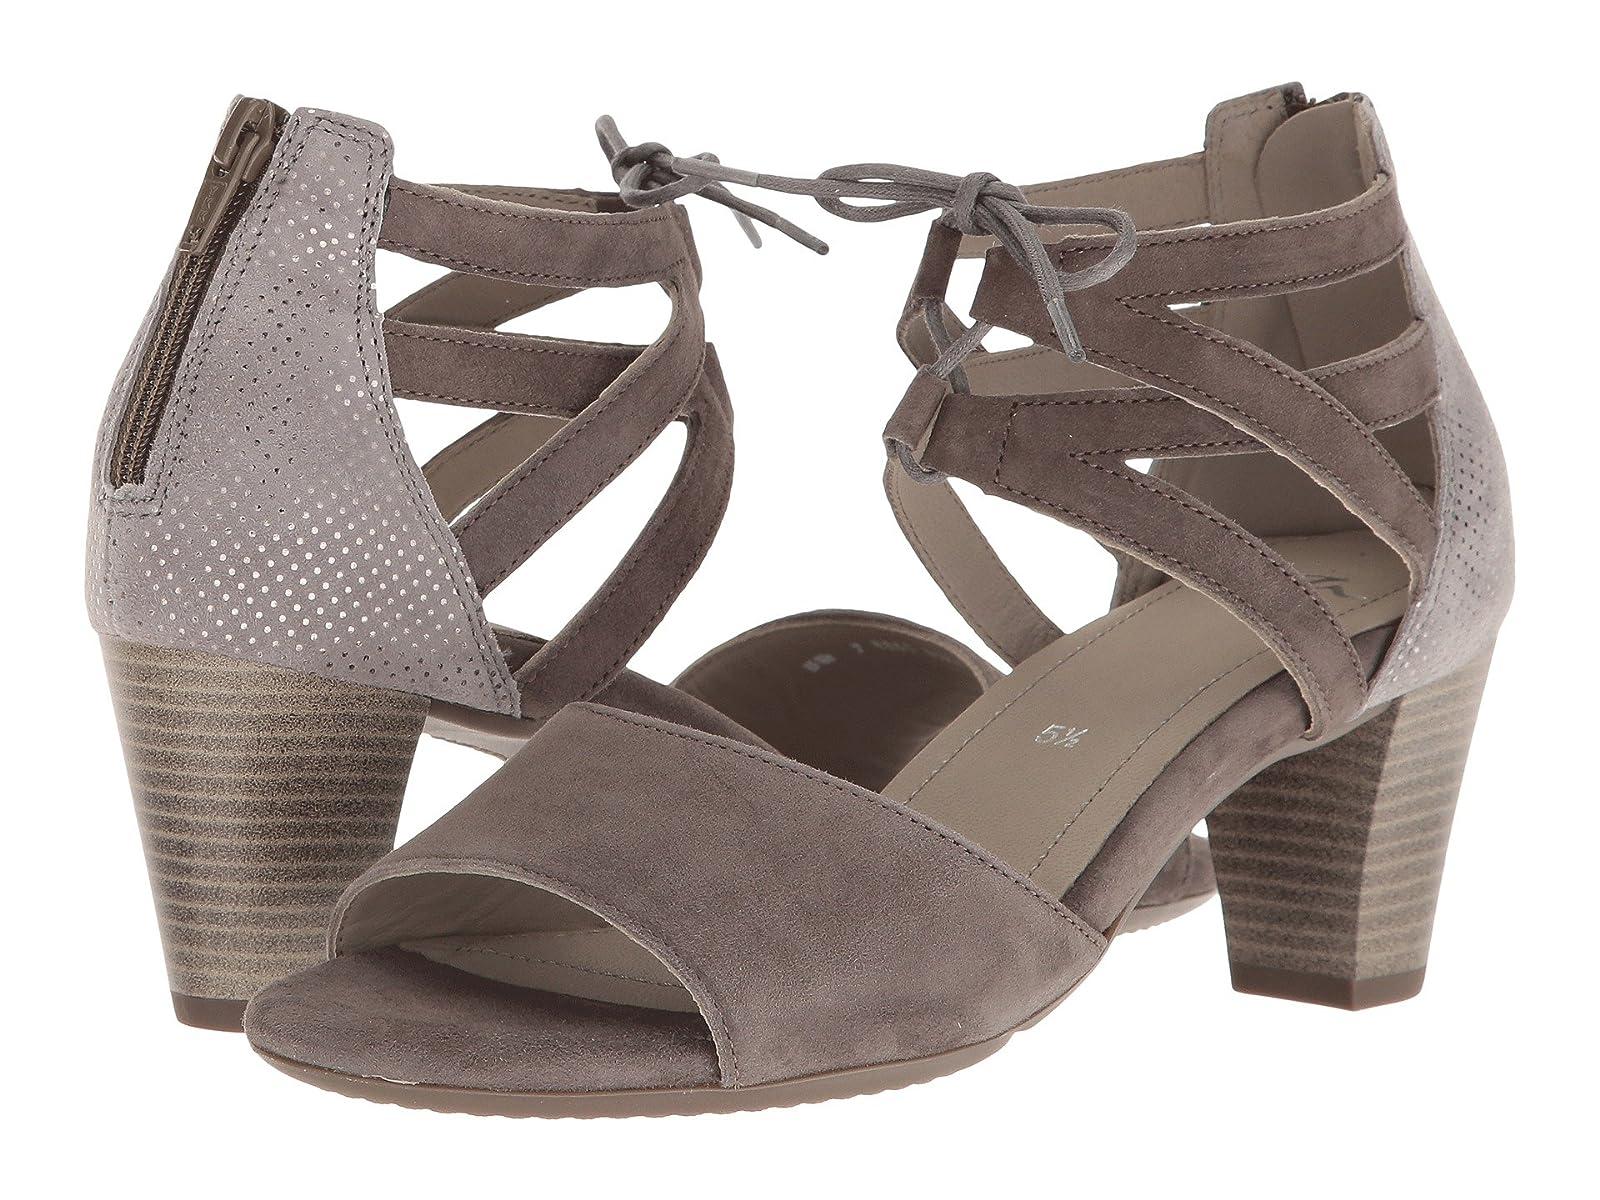 ara RacquelCheap and distinctive eye-catching shoes